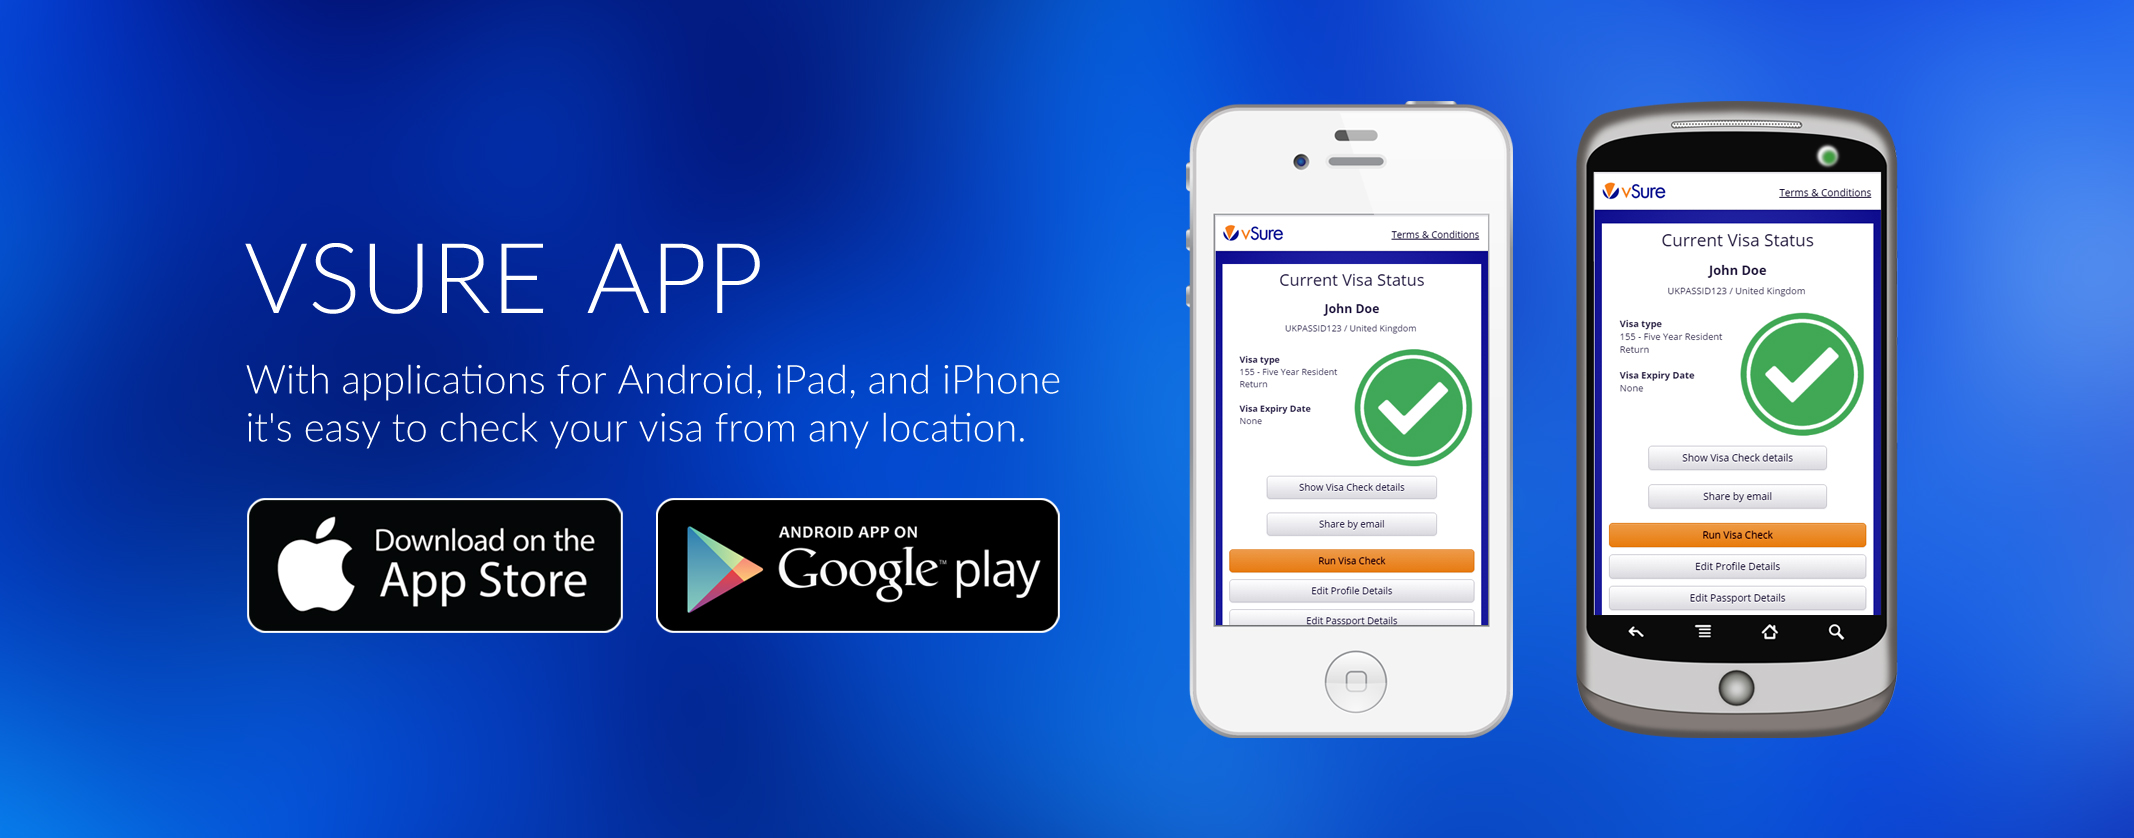 Check your own visa status - vSure Mobile App